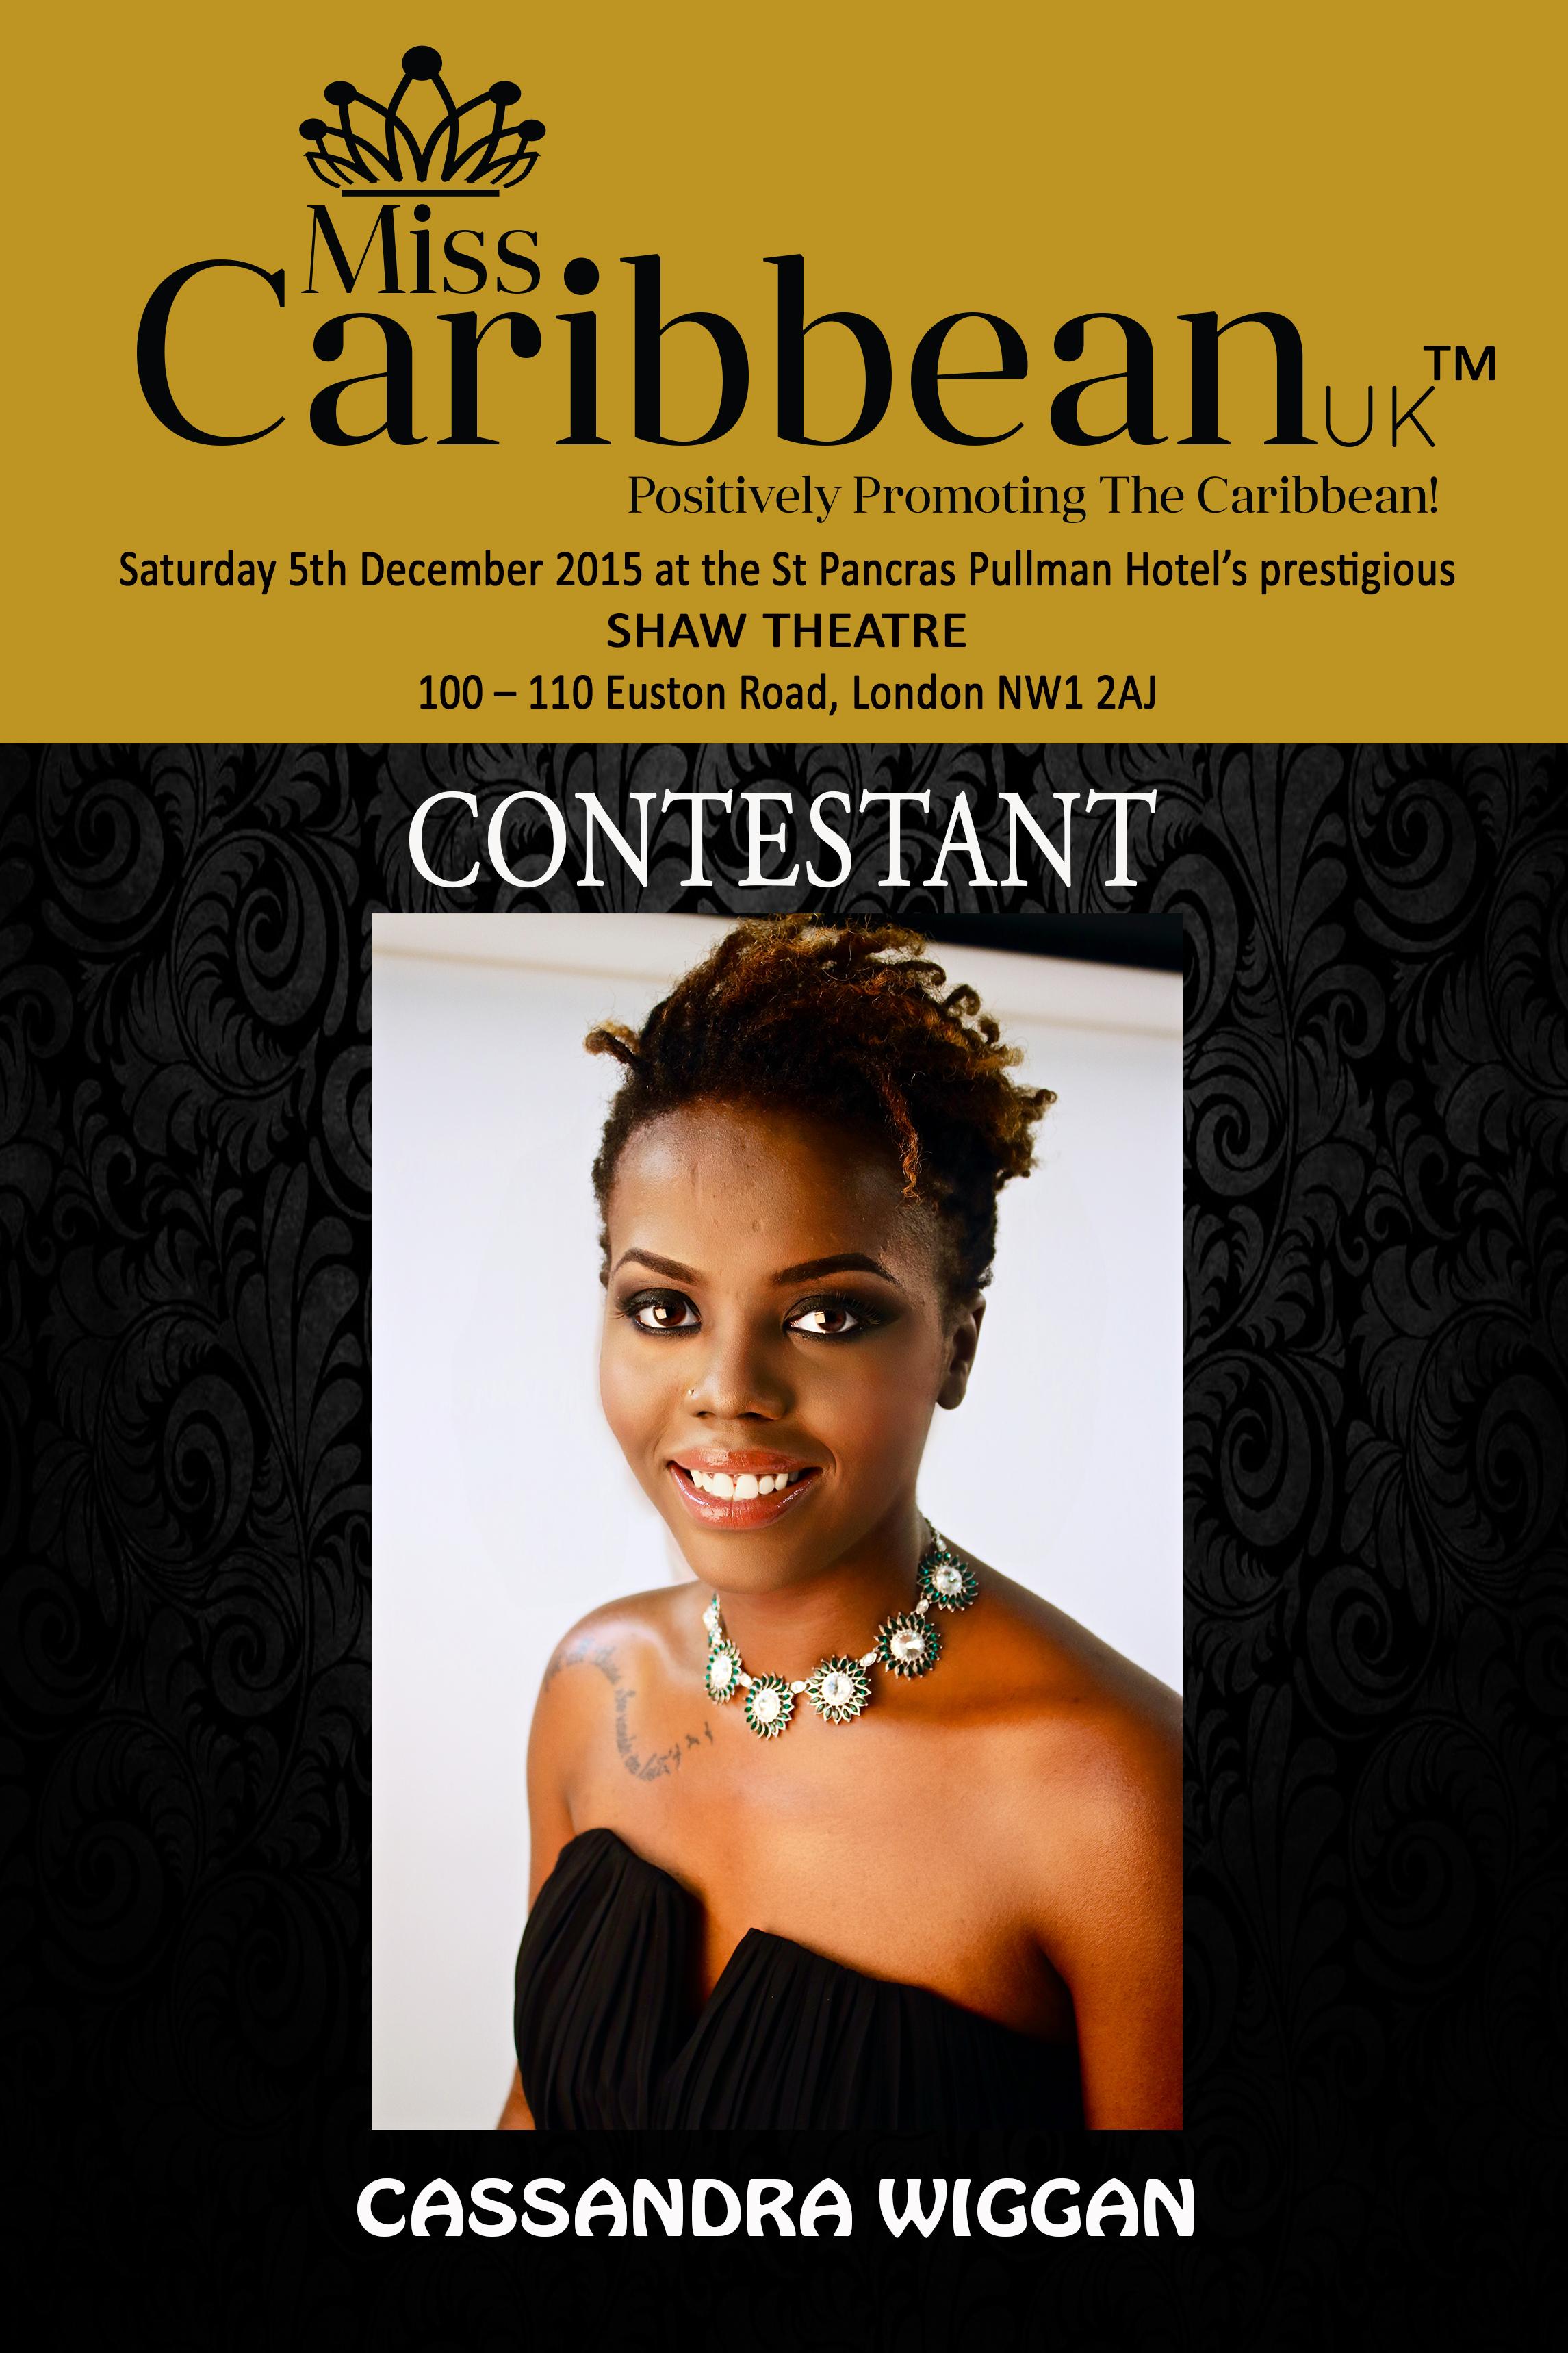 CONTESTANT - Cassandra Wiggan.